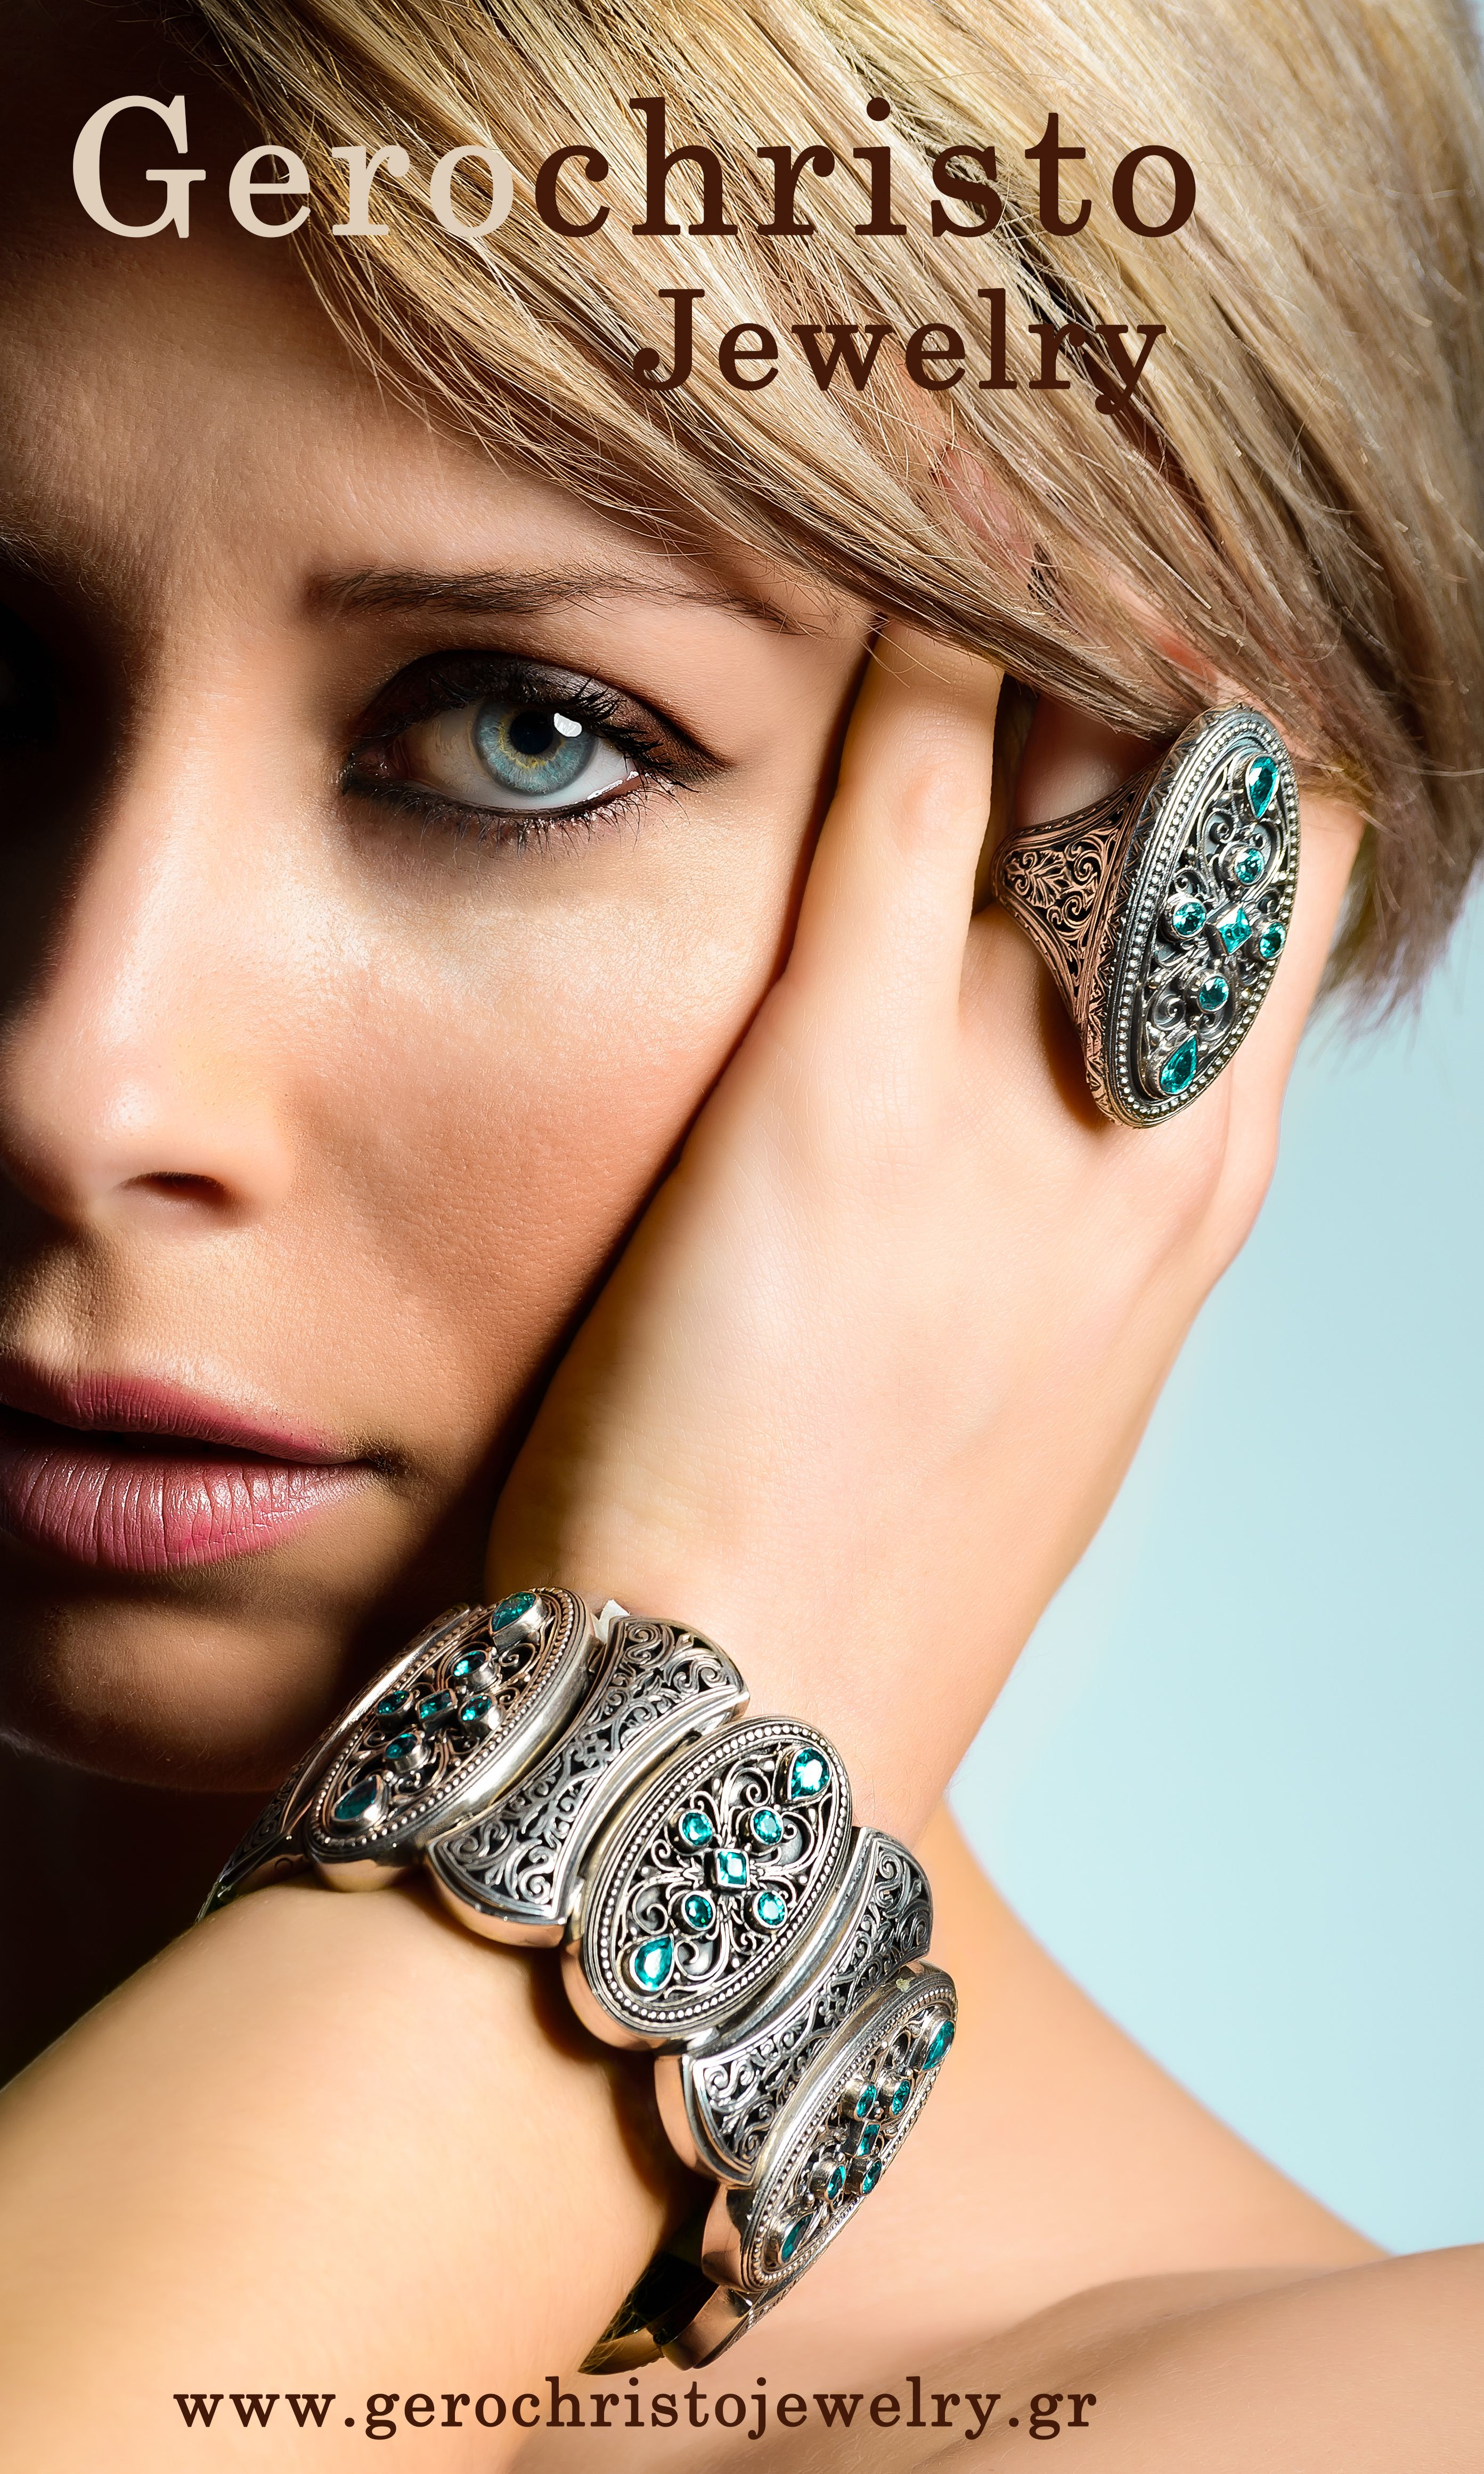 Bracelet and ring in sterling silver with Blue topaz stones #Bluetopaz #luxuryjewelry #Greekdesigner